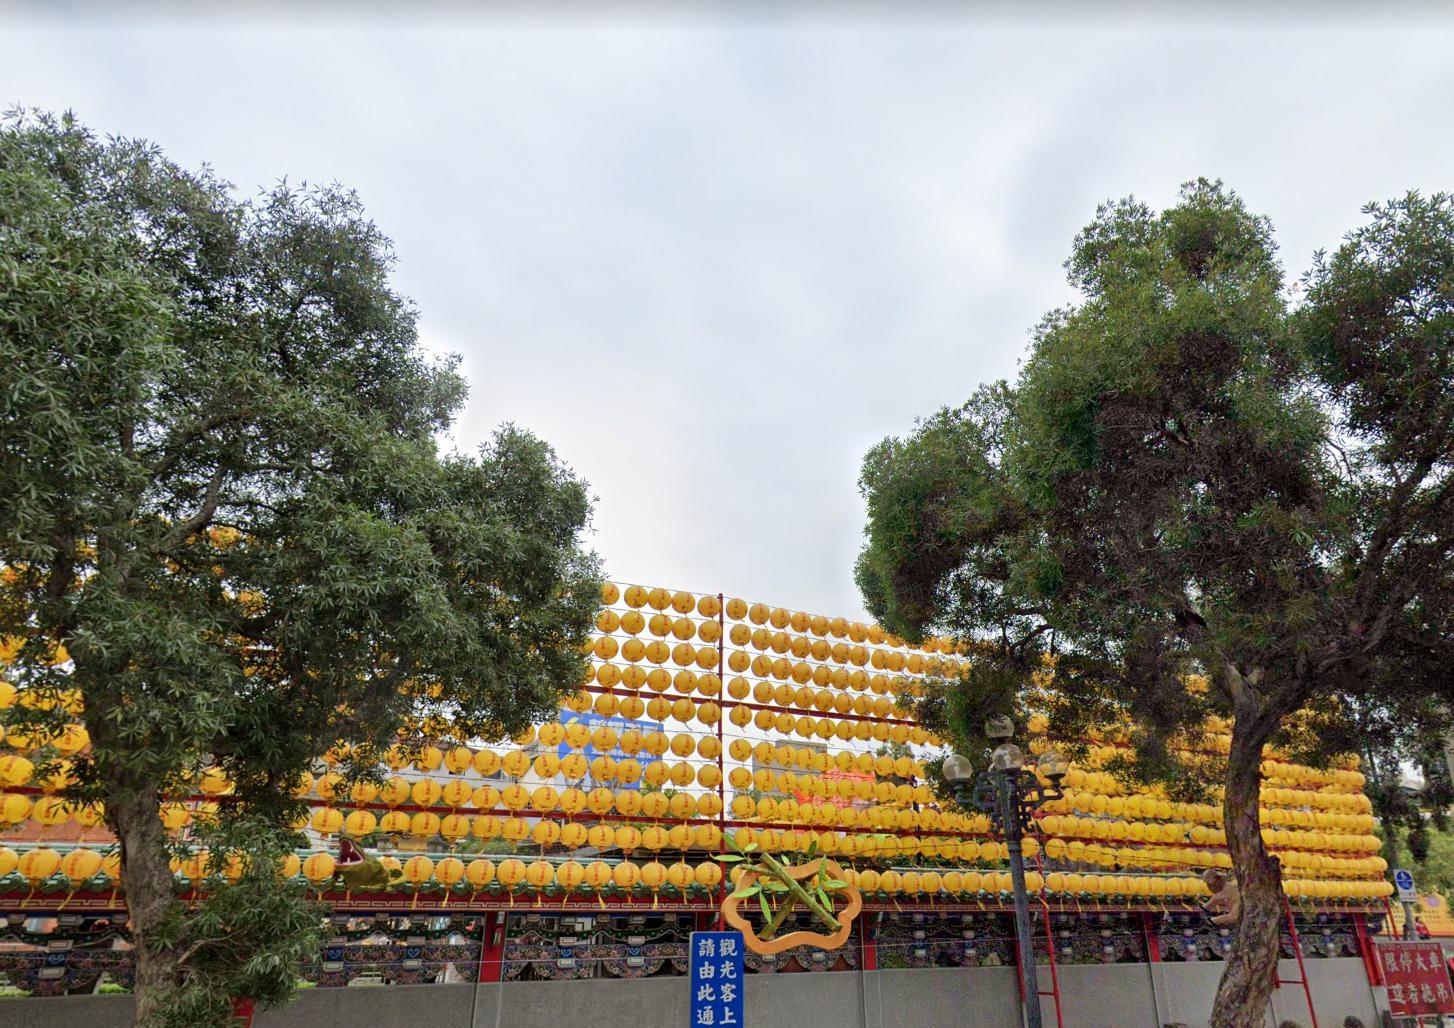 台湾の占い口コミ「芷羚論命」陳芷羚先生